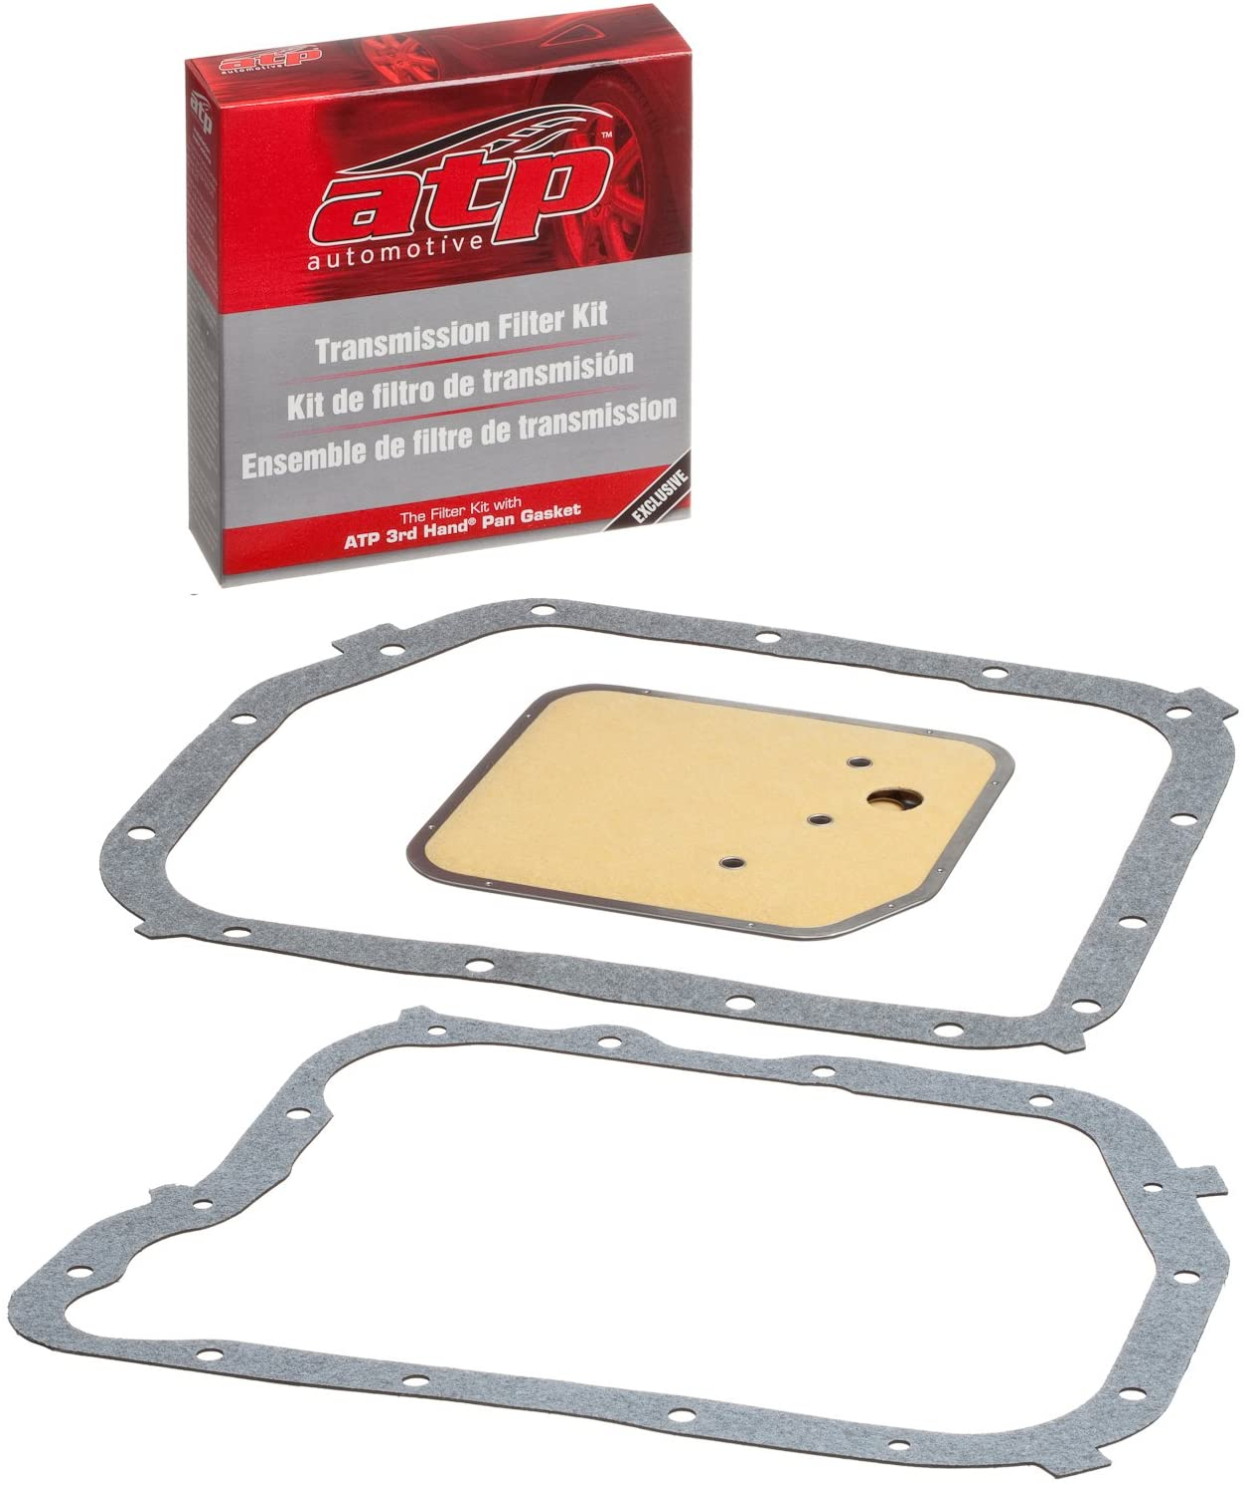 ATP B-68 Automatic Transmission Filter Kit